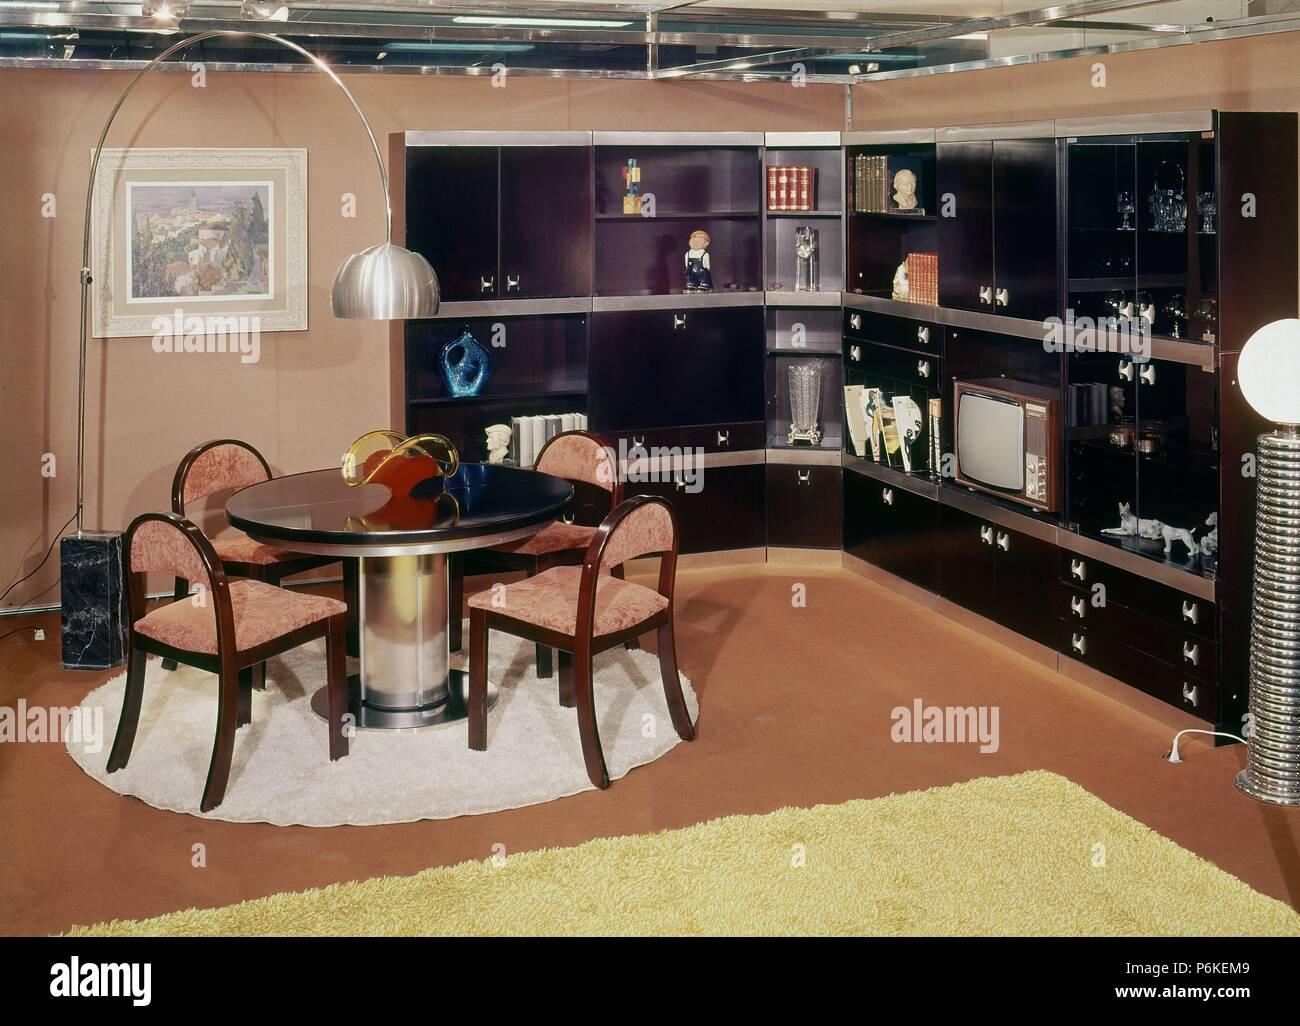 DECORACION-salon Comedor: Años 70 Stockfoto, Bild: 210640985 - Alamy